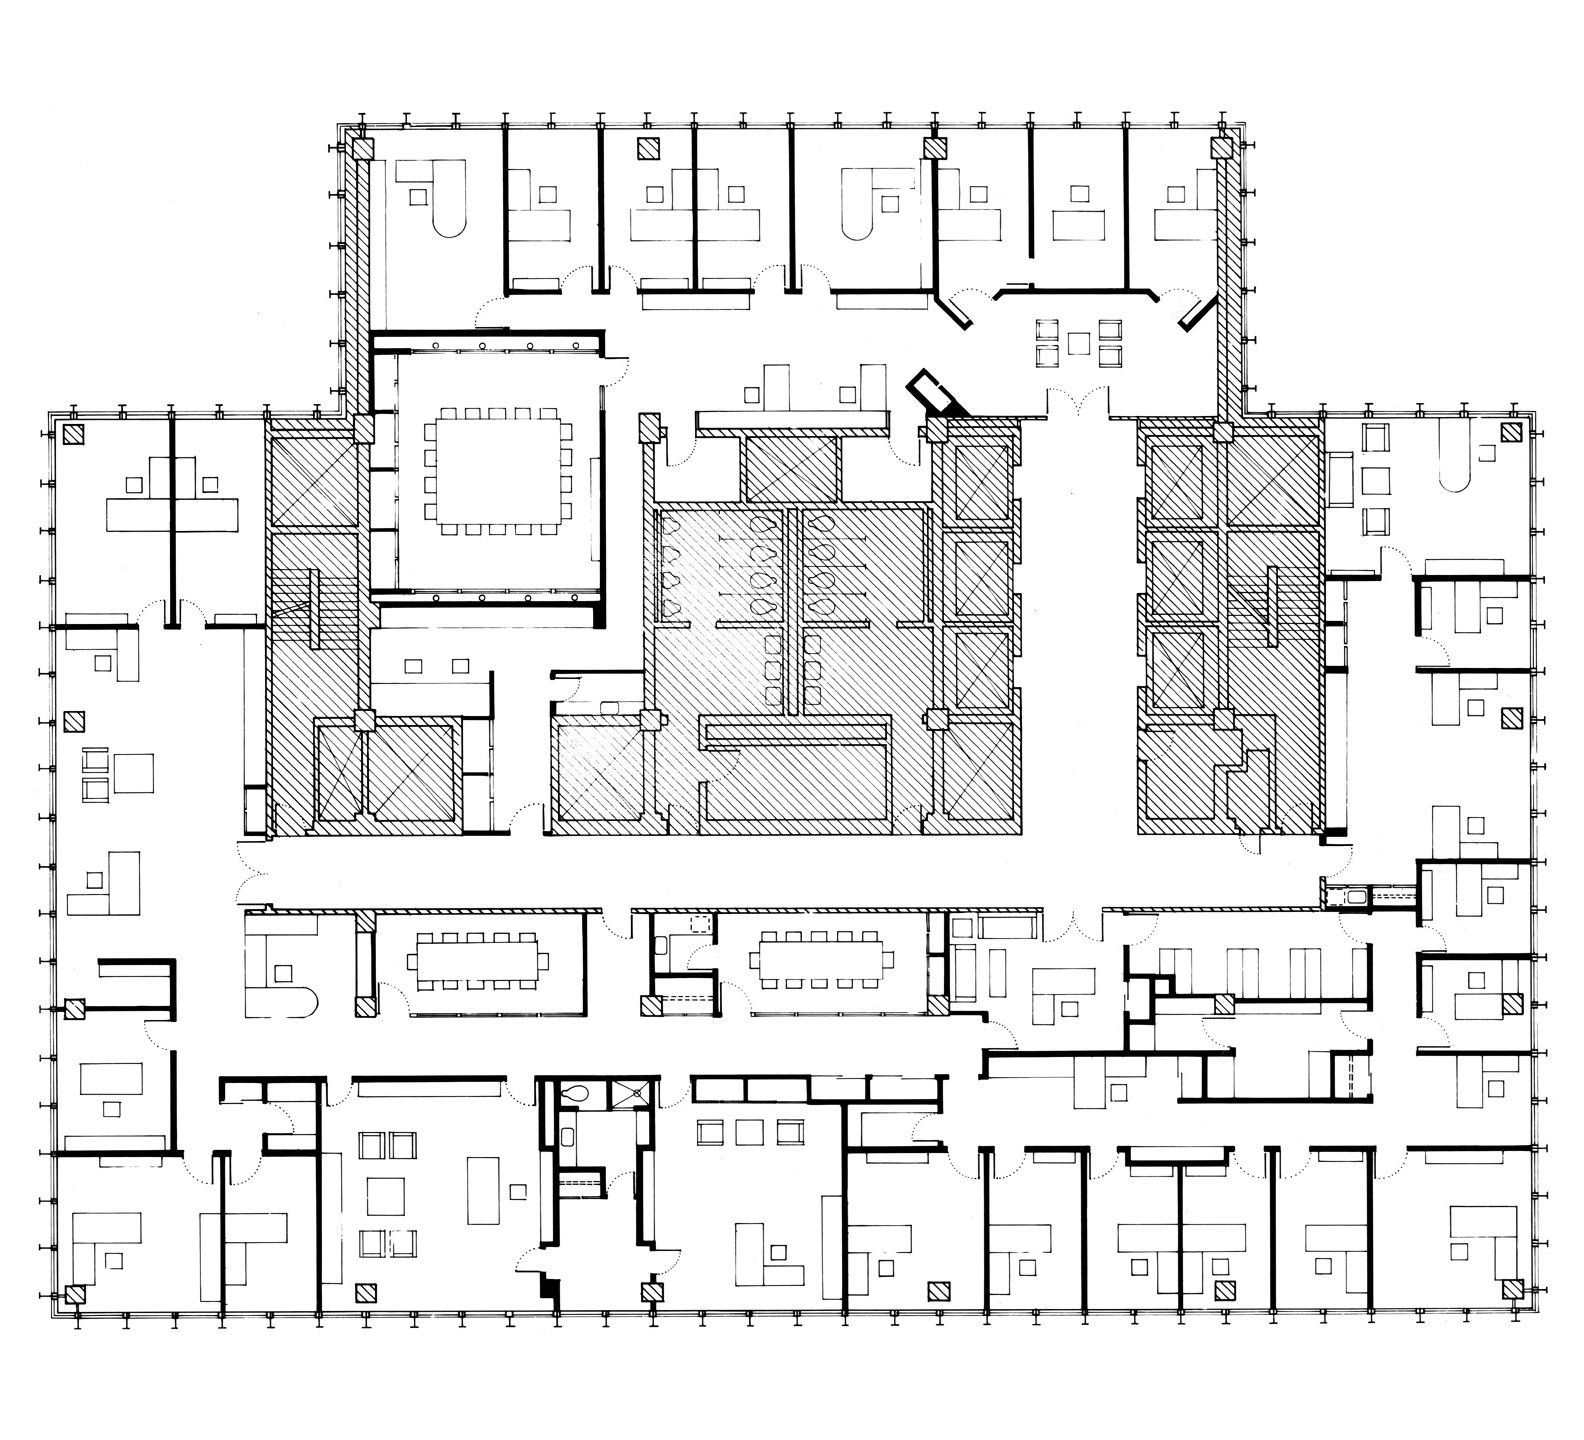 Seagram Building Plan In The Seagram Building